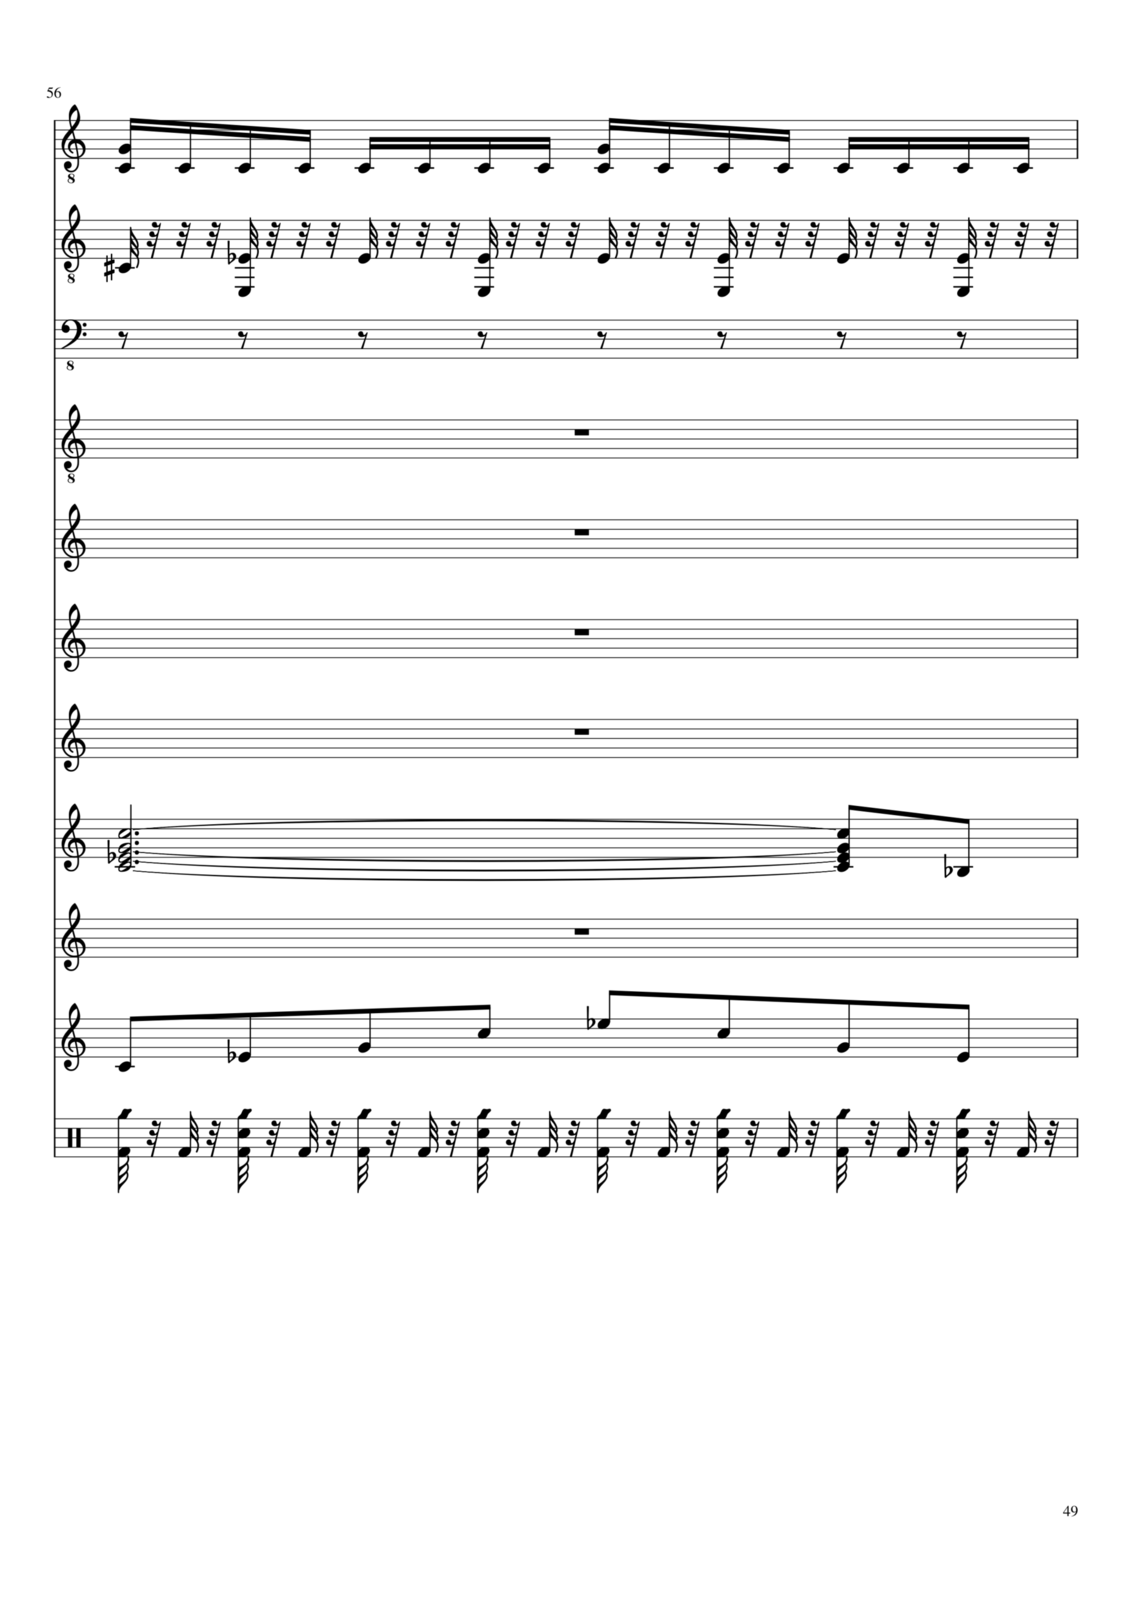 Belyiy sokol slide, Image 49